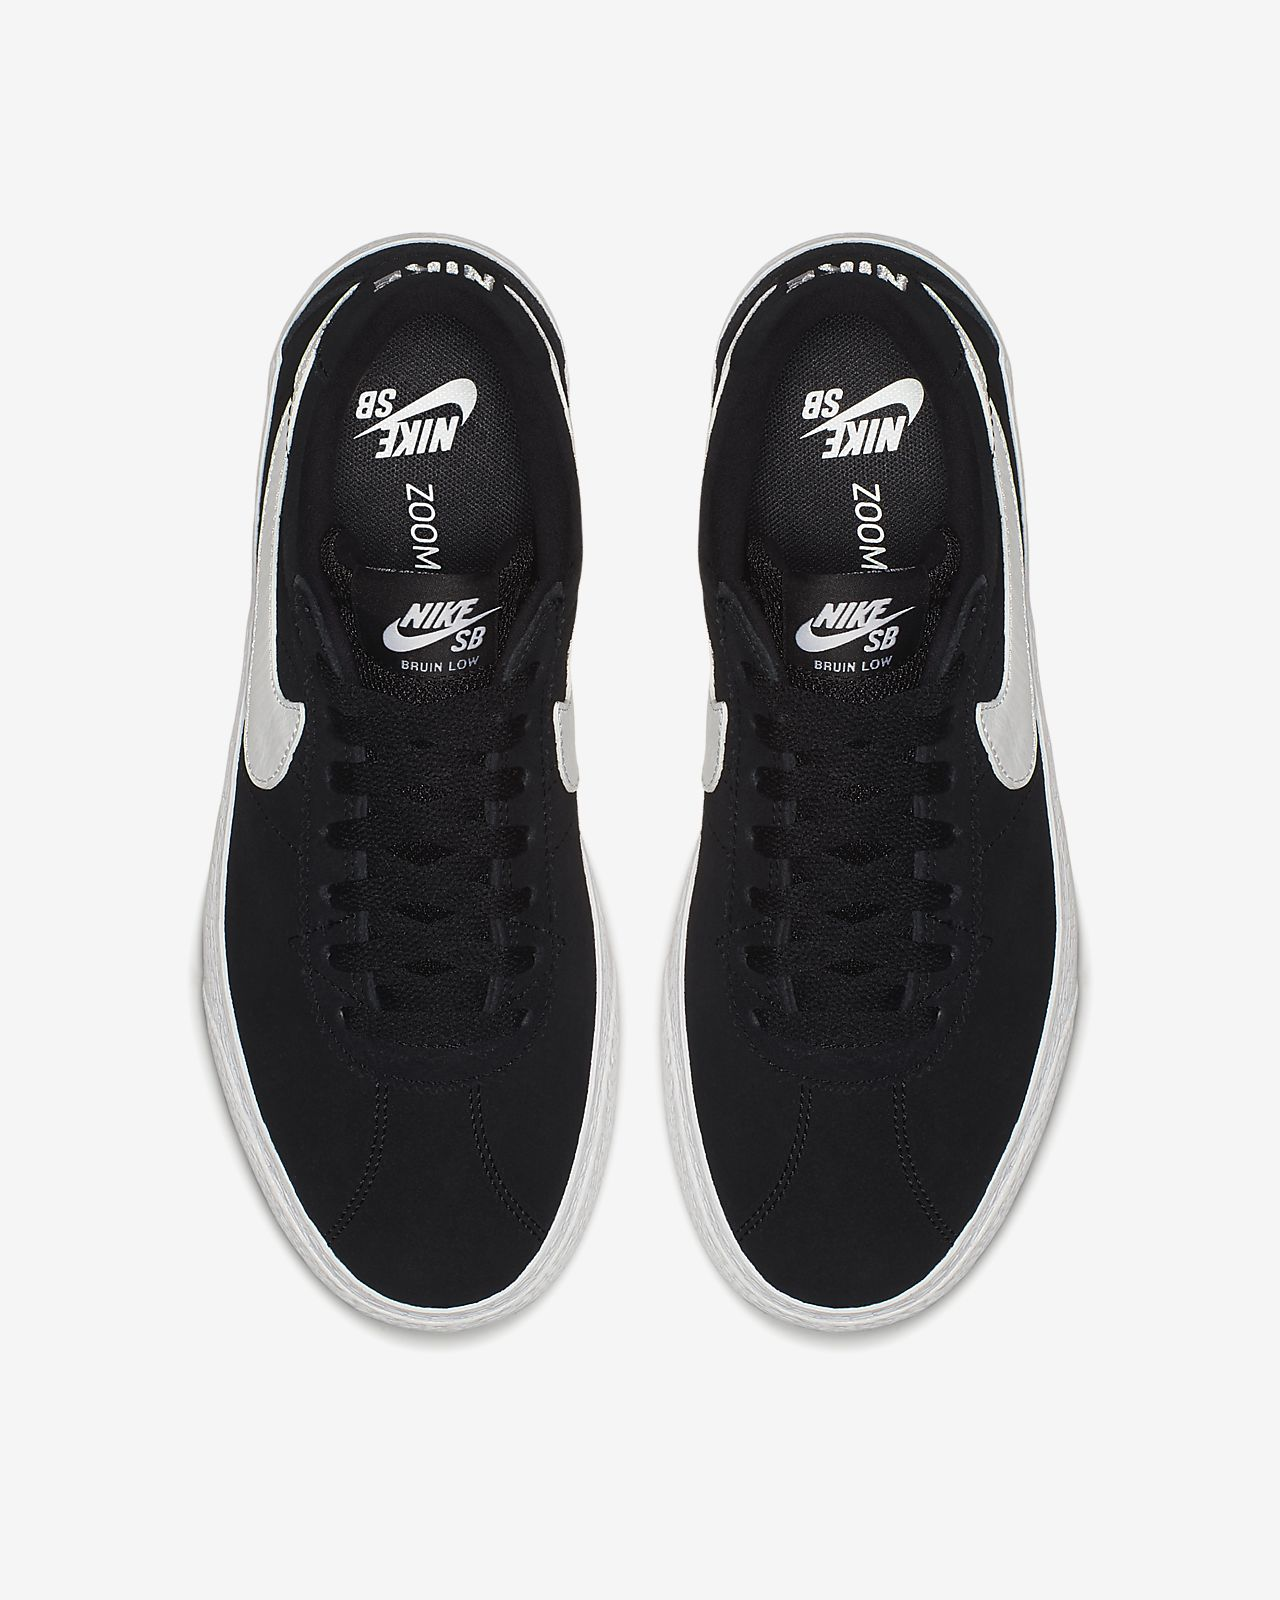 De Sb FemmeCa Low Nike Bruin Pour Chaussure Skateboard Zoom E2D9IH